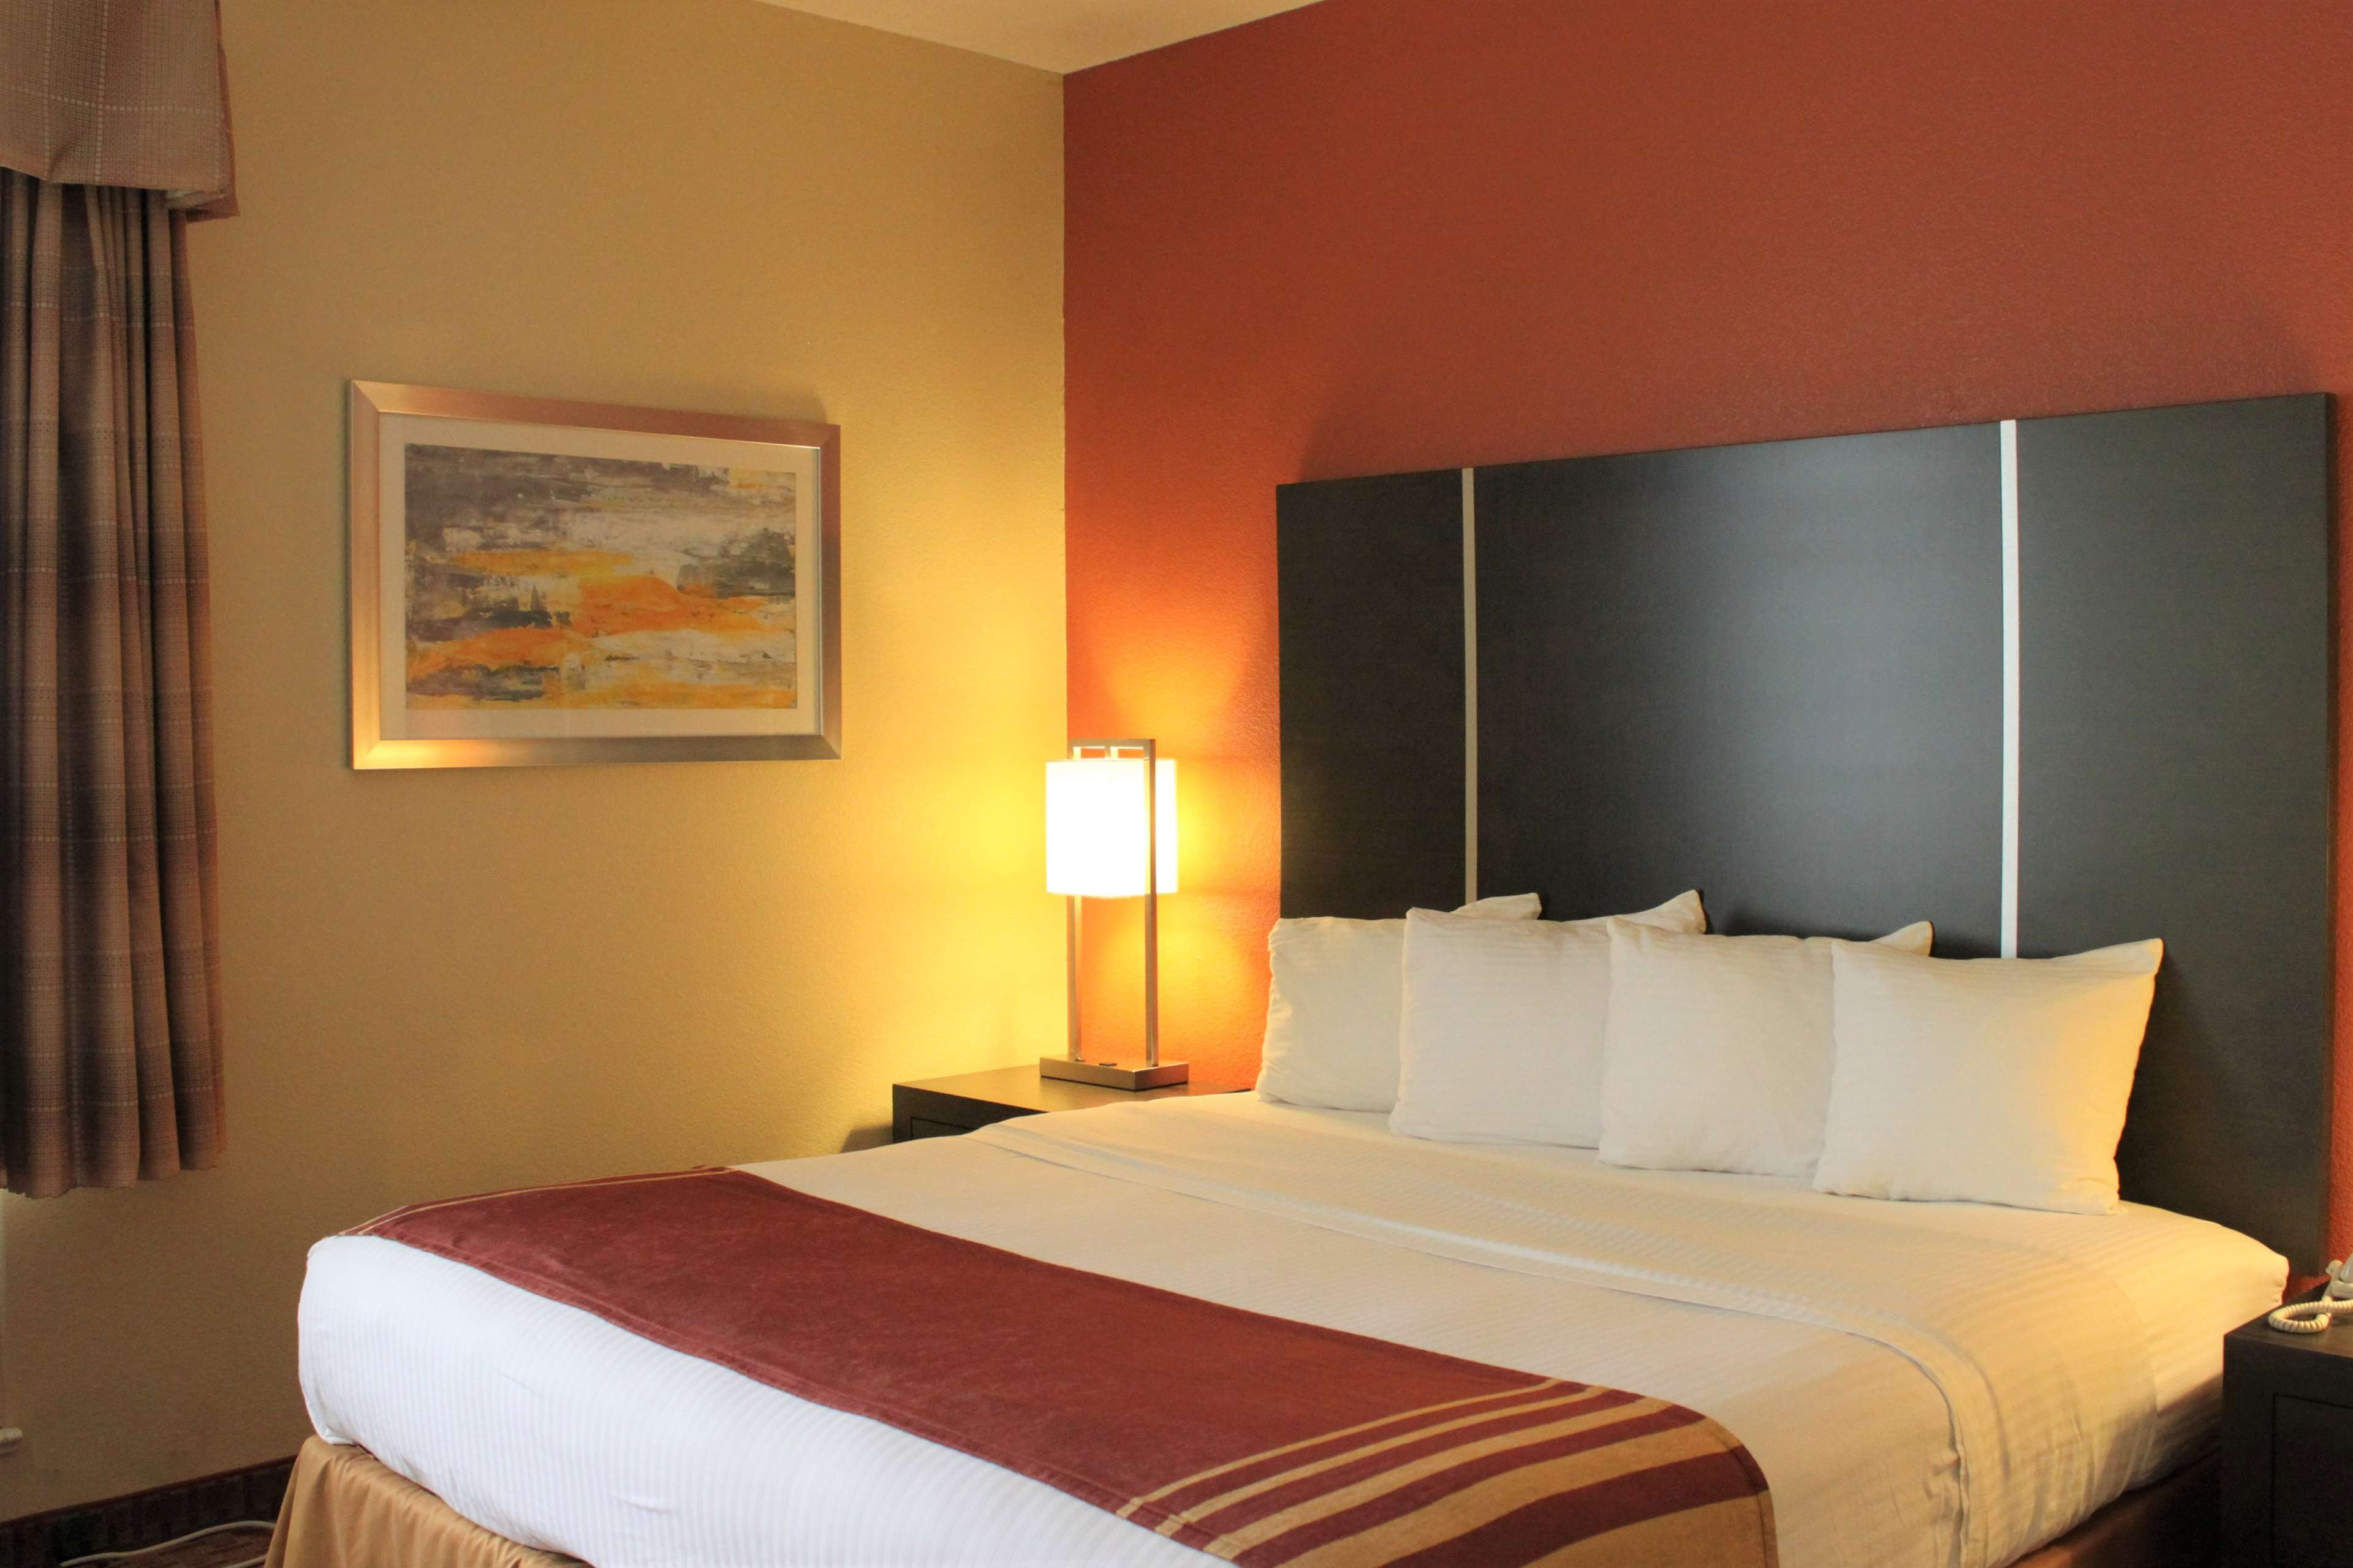 Best Western Plus North Houston Inn & Suites image 16